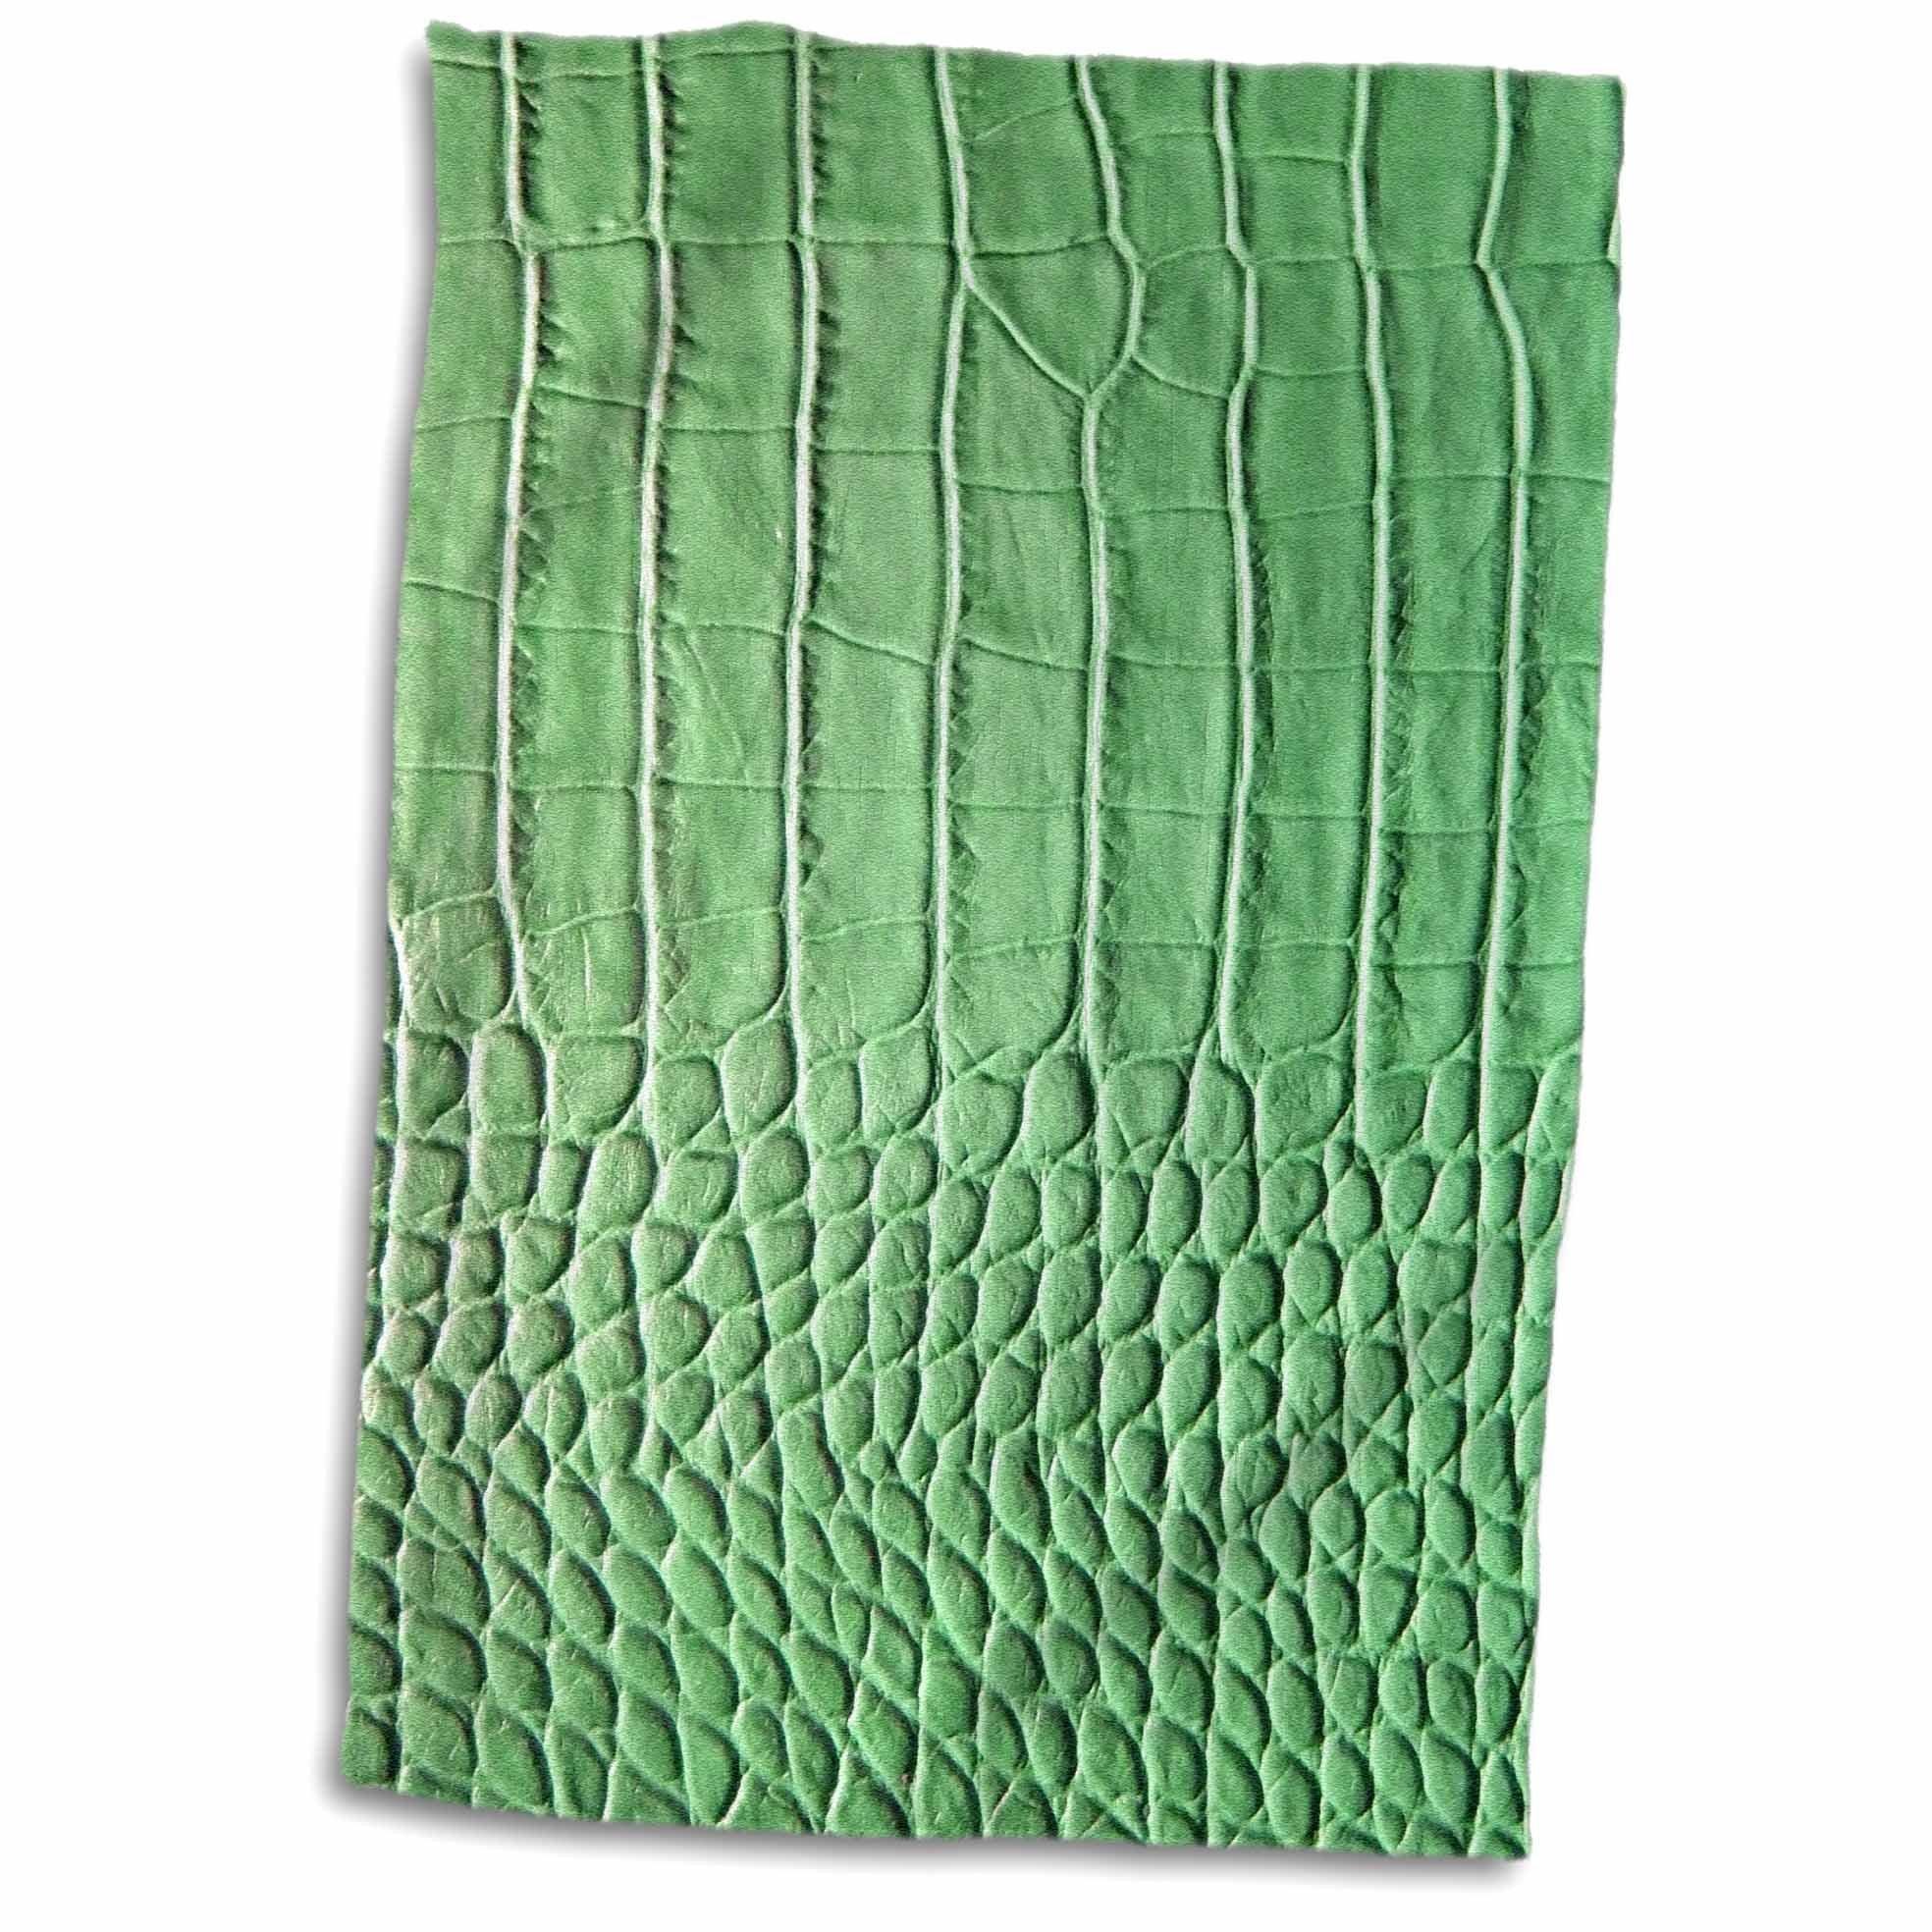 3D Rose Green Crocodile Skin Photo Print - Macro Photography Aligator Animal Texture - Reptile Lizard Scales Towel, 15'' x 22'', Multicolor